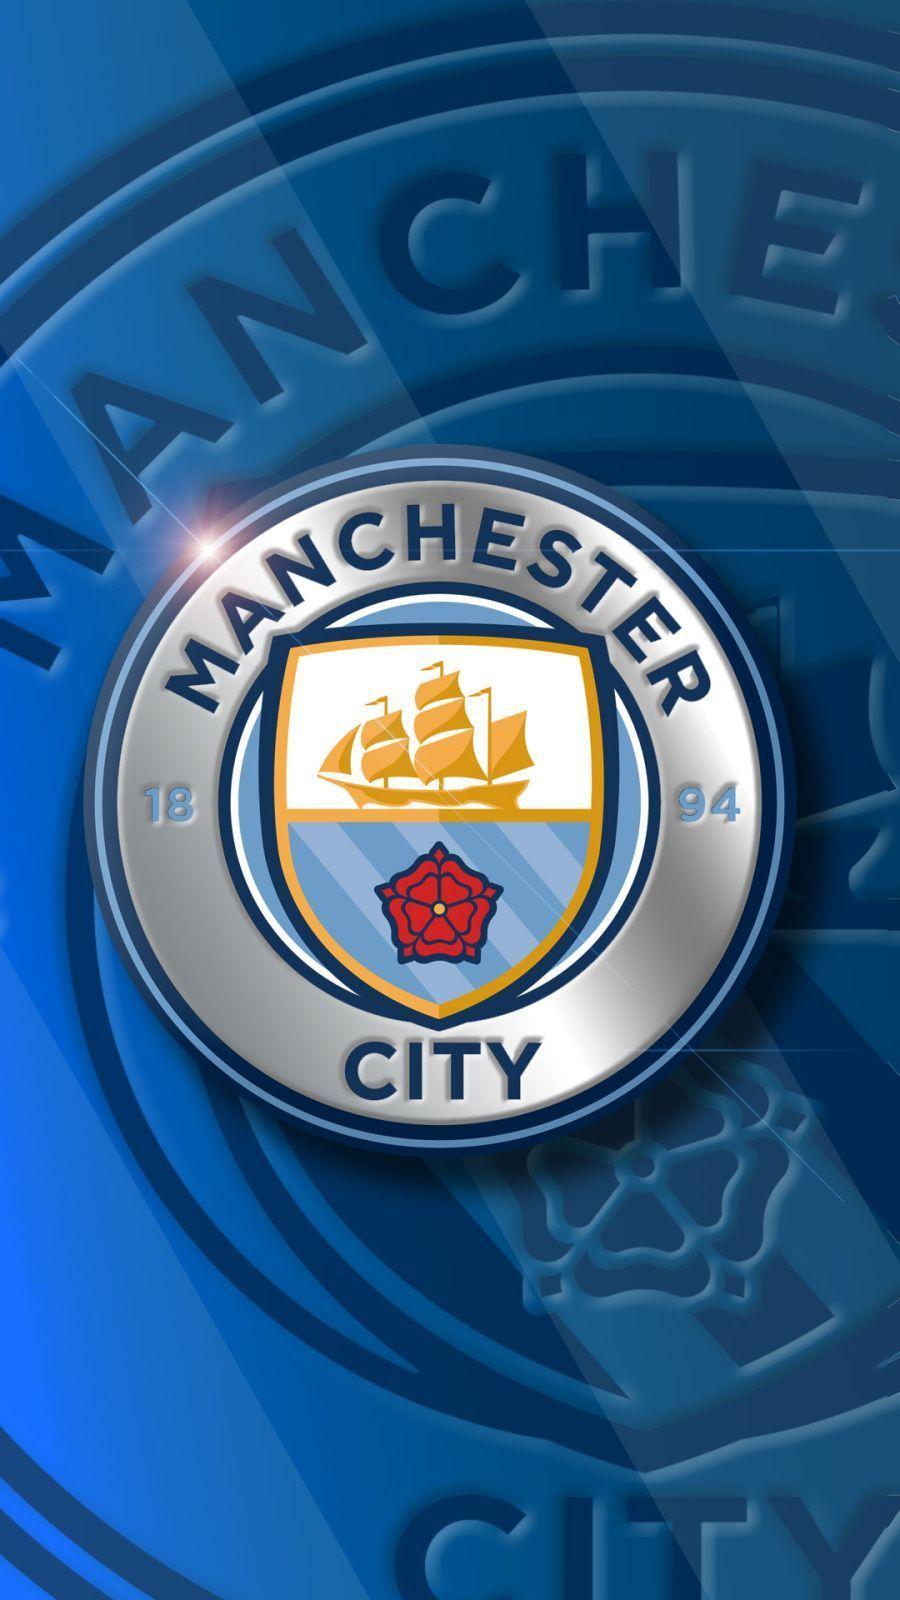 21 Manchester City Logos Wallpapers On Wallpapersafari